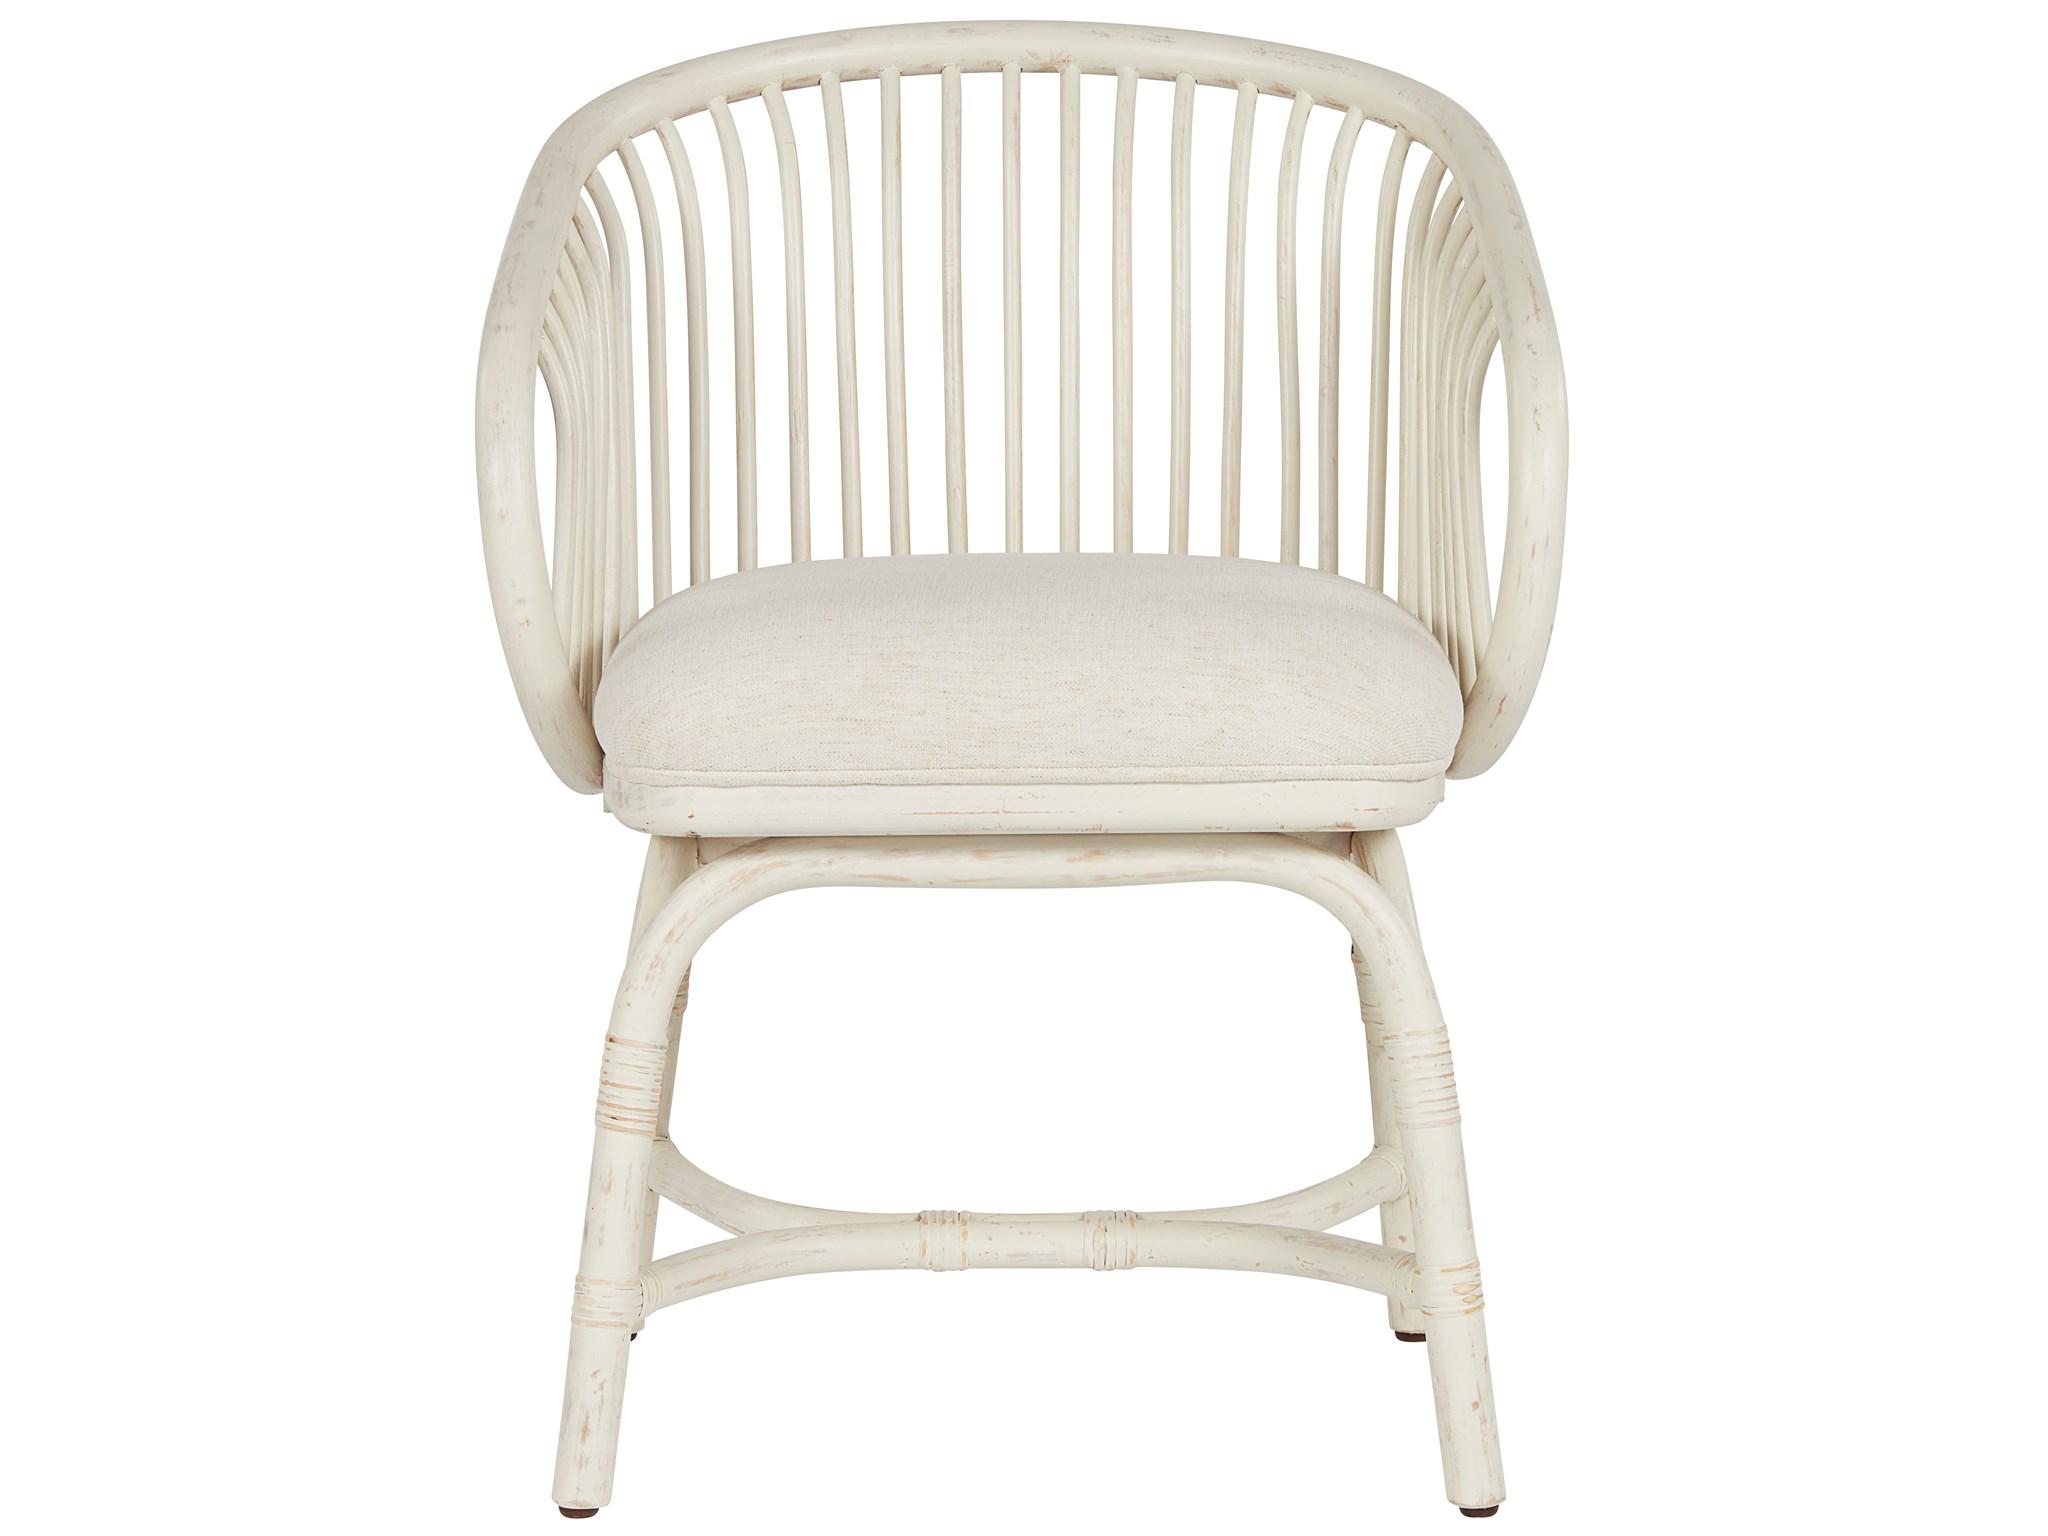 Aruba Rattan Chair